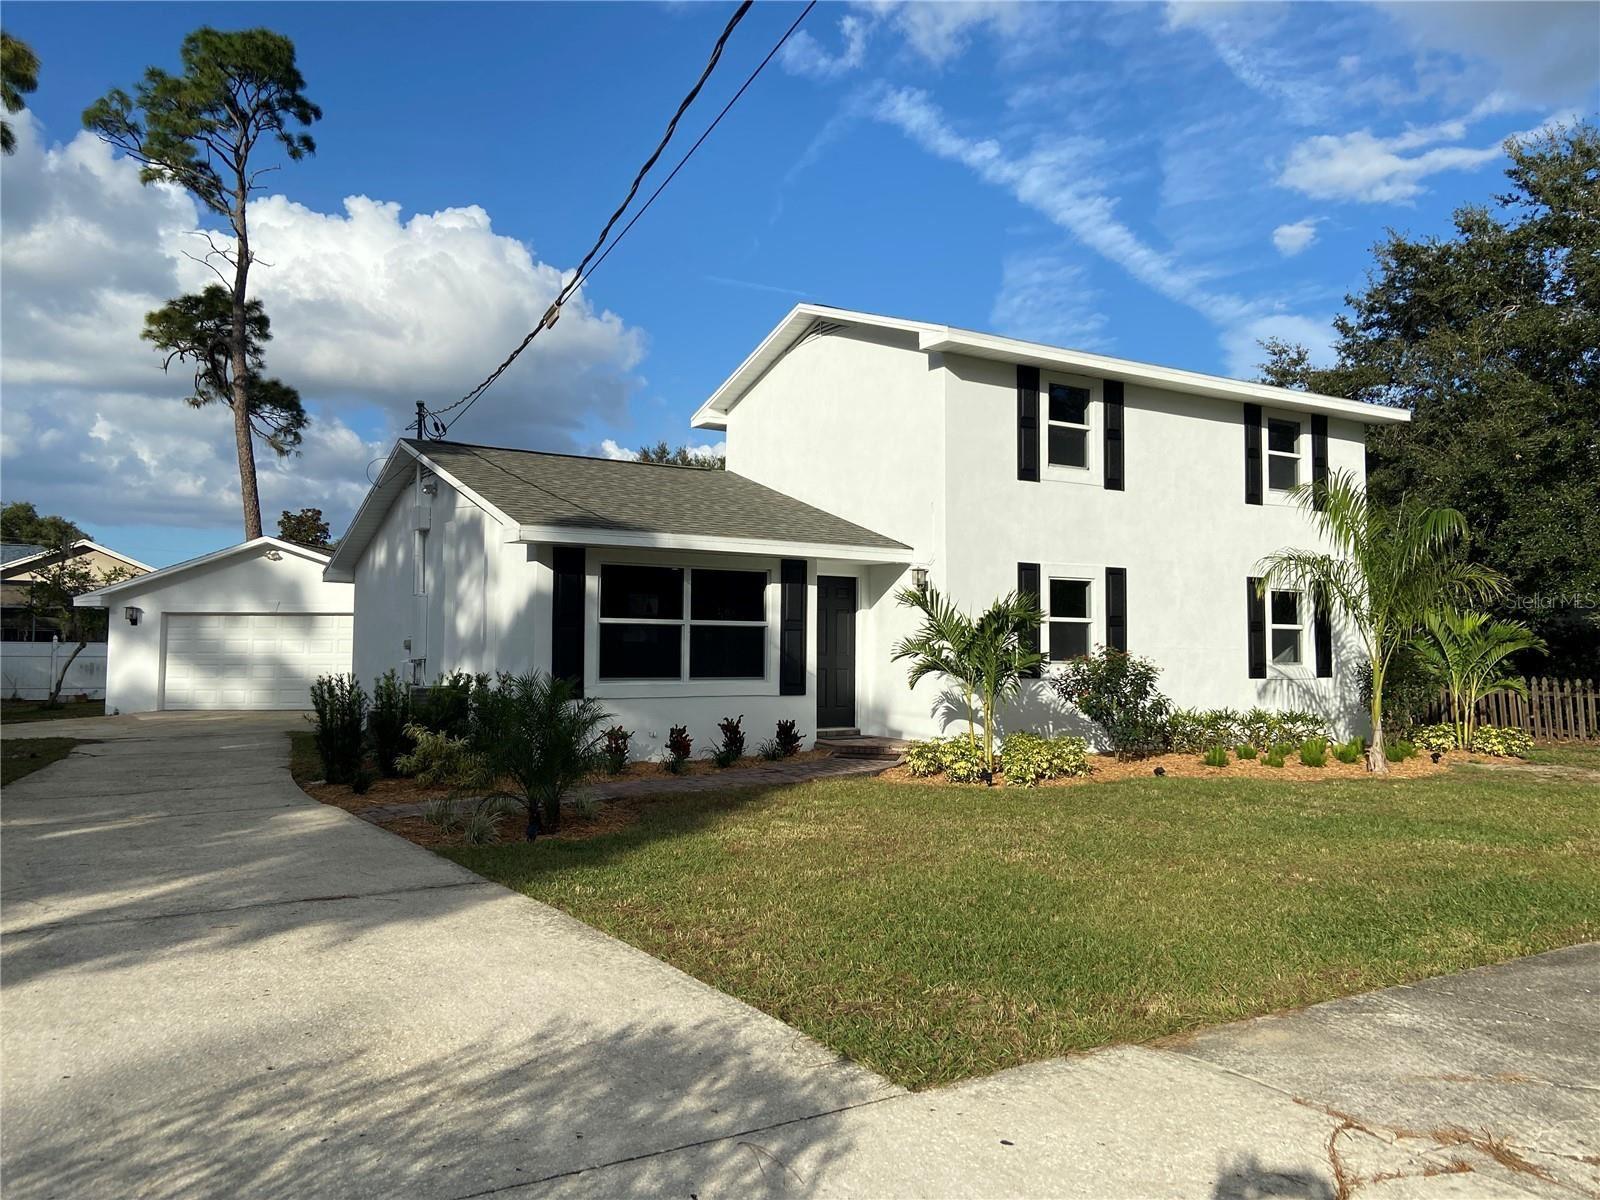 1702 MEXICO AVENUE, Tarpon Springs, FL 34689 - MLS#: U8135411